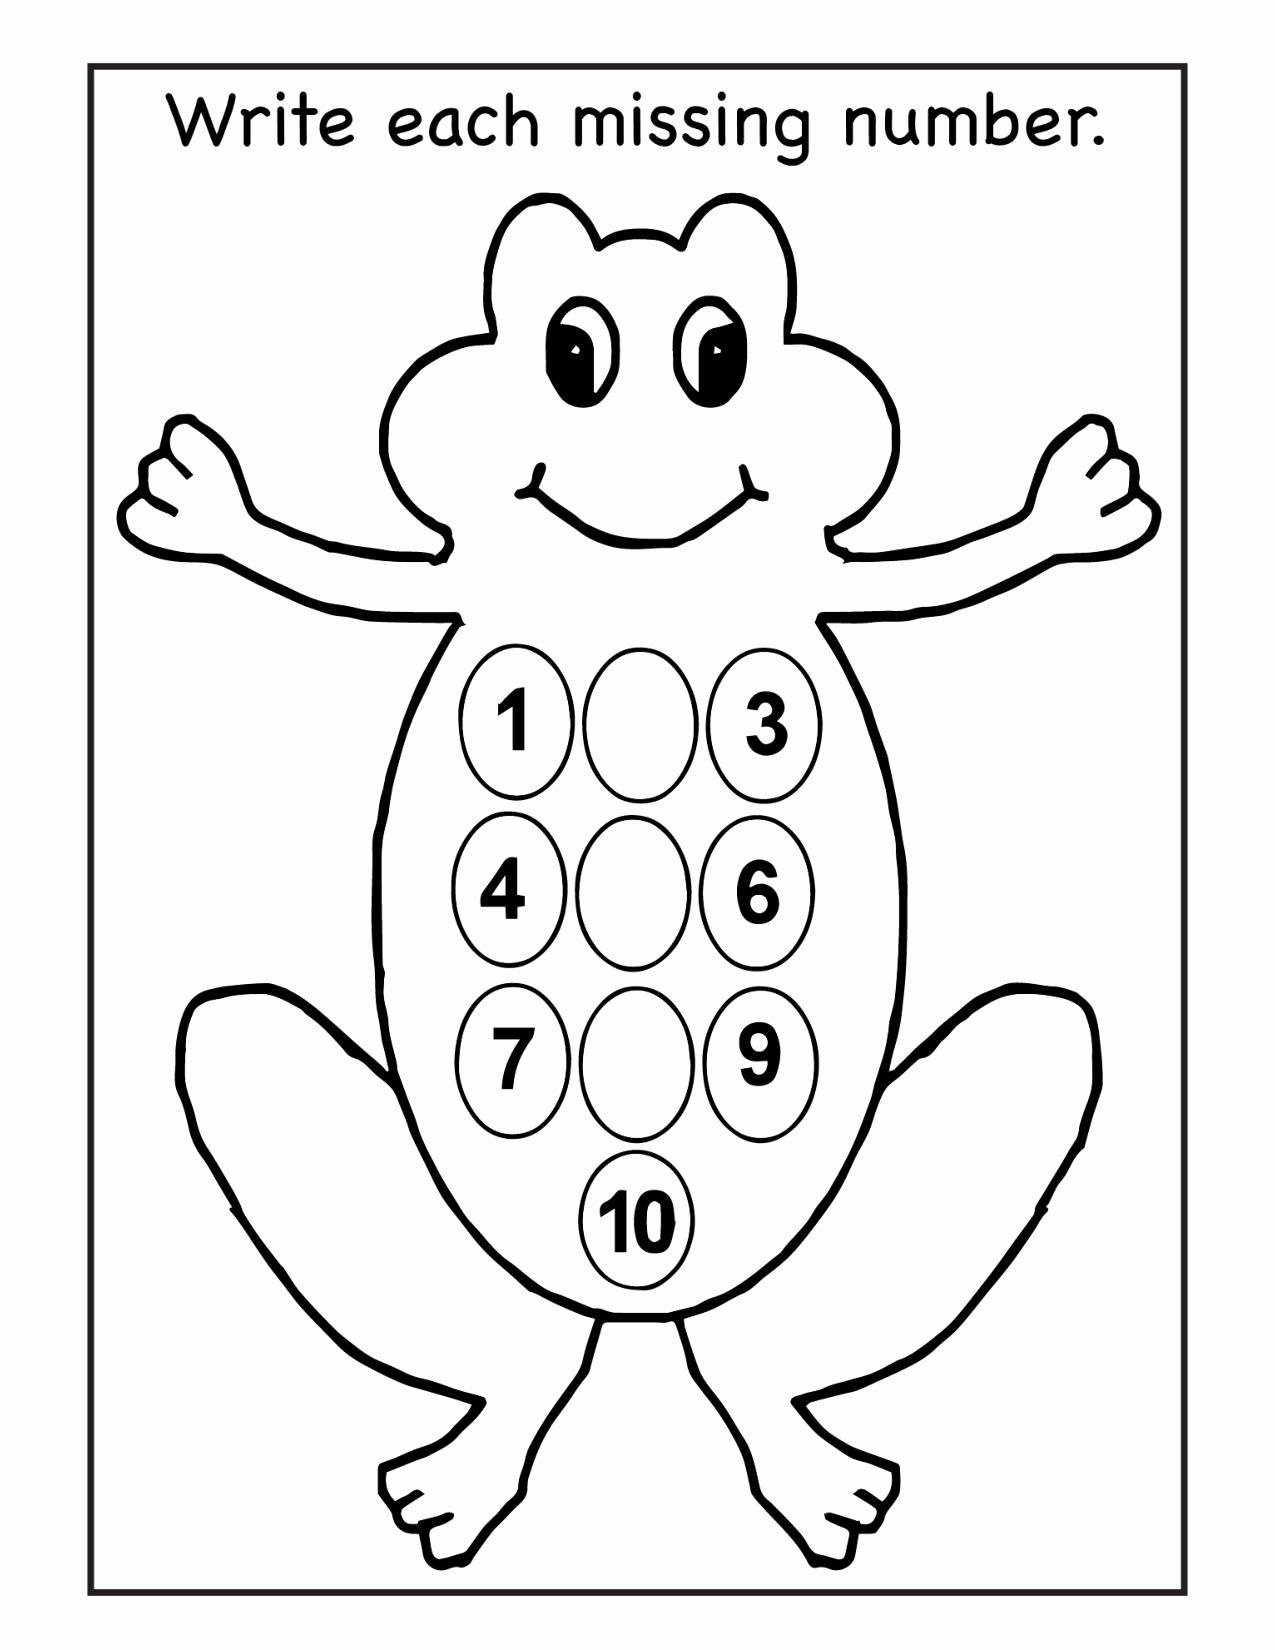 Number 10 Worksheets for Preschoolers Beautiful Worksheets Number Worksheet Missing Printable Worksheets